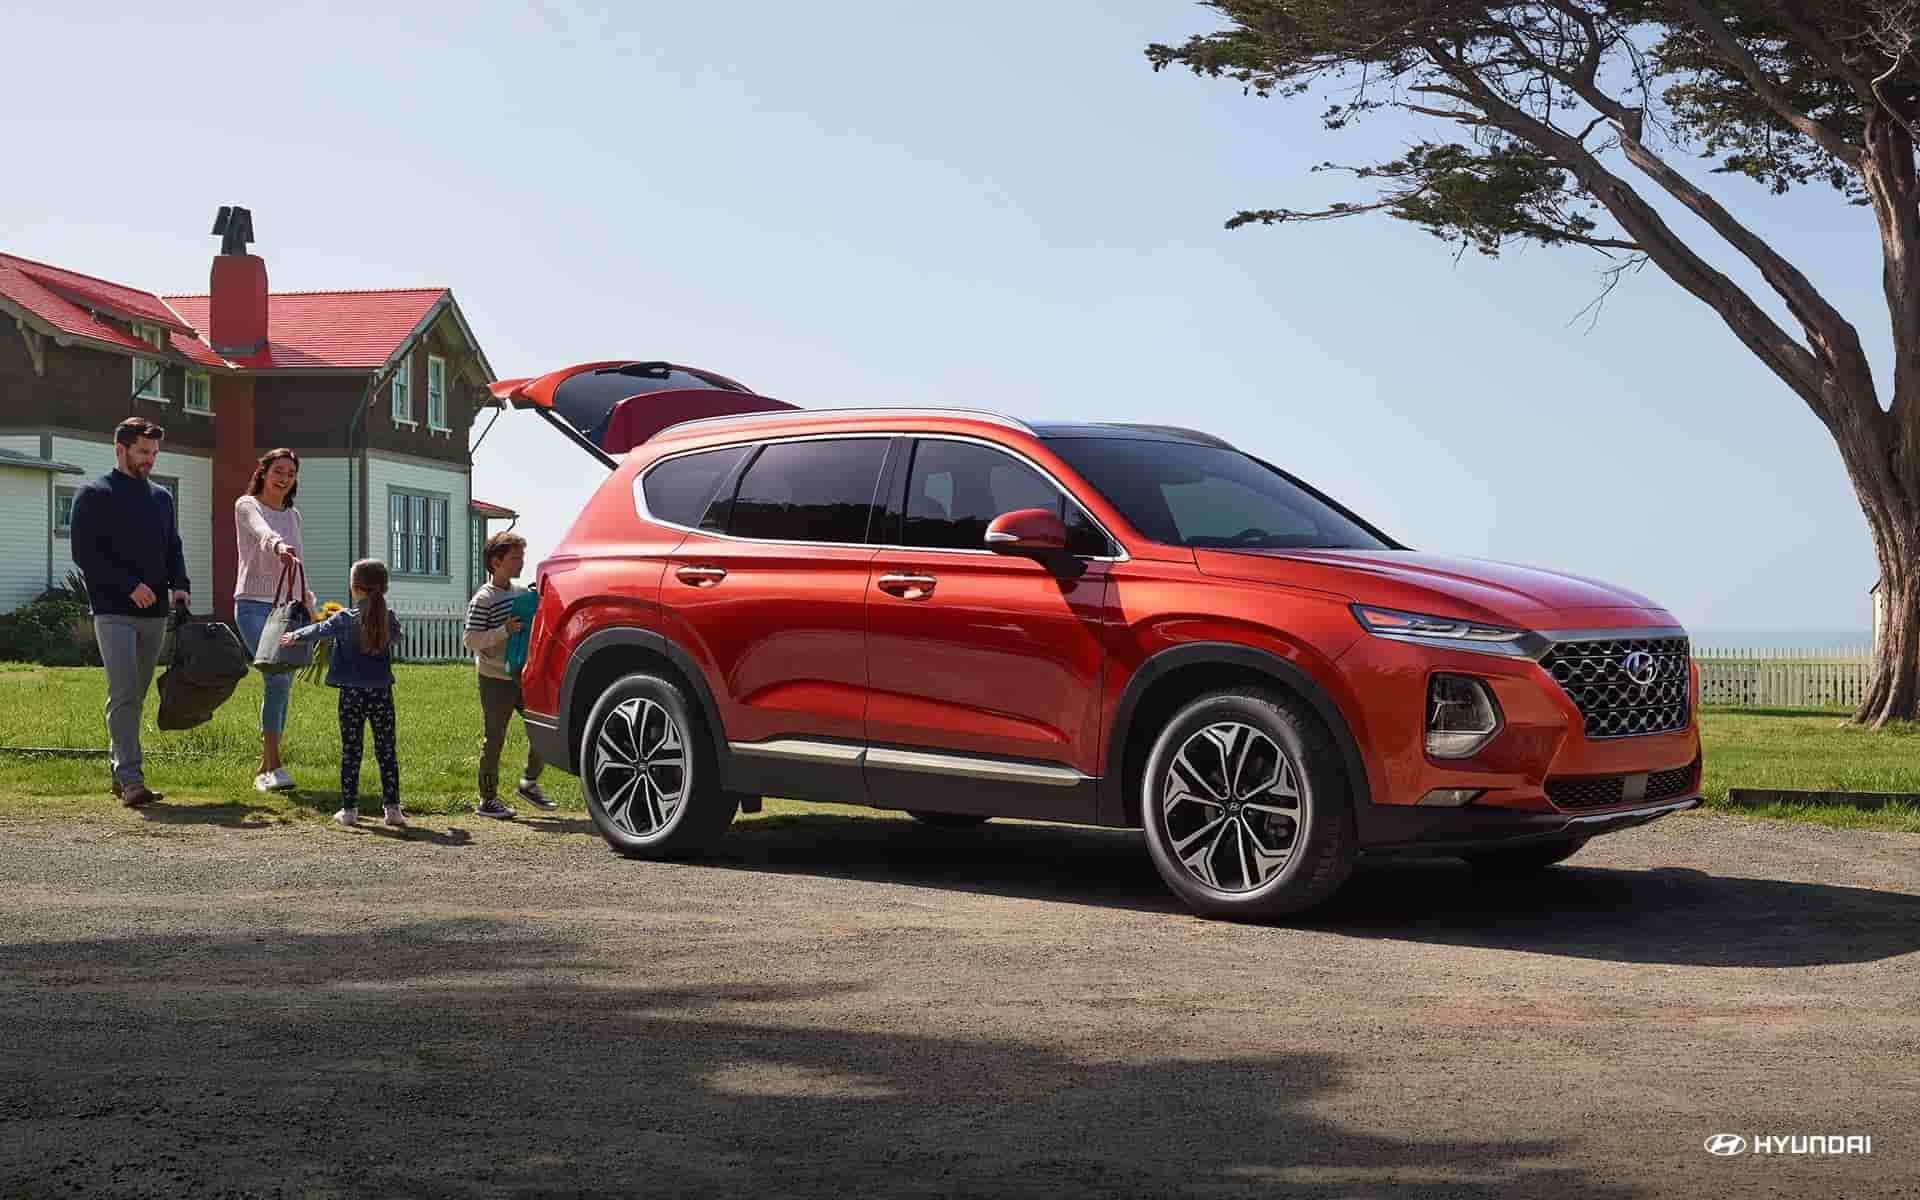 Boulder Shoppers Pick 2020 Hyundai Santa Fe Over 2020 Kia Sorento